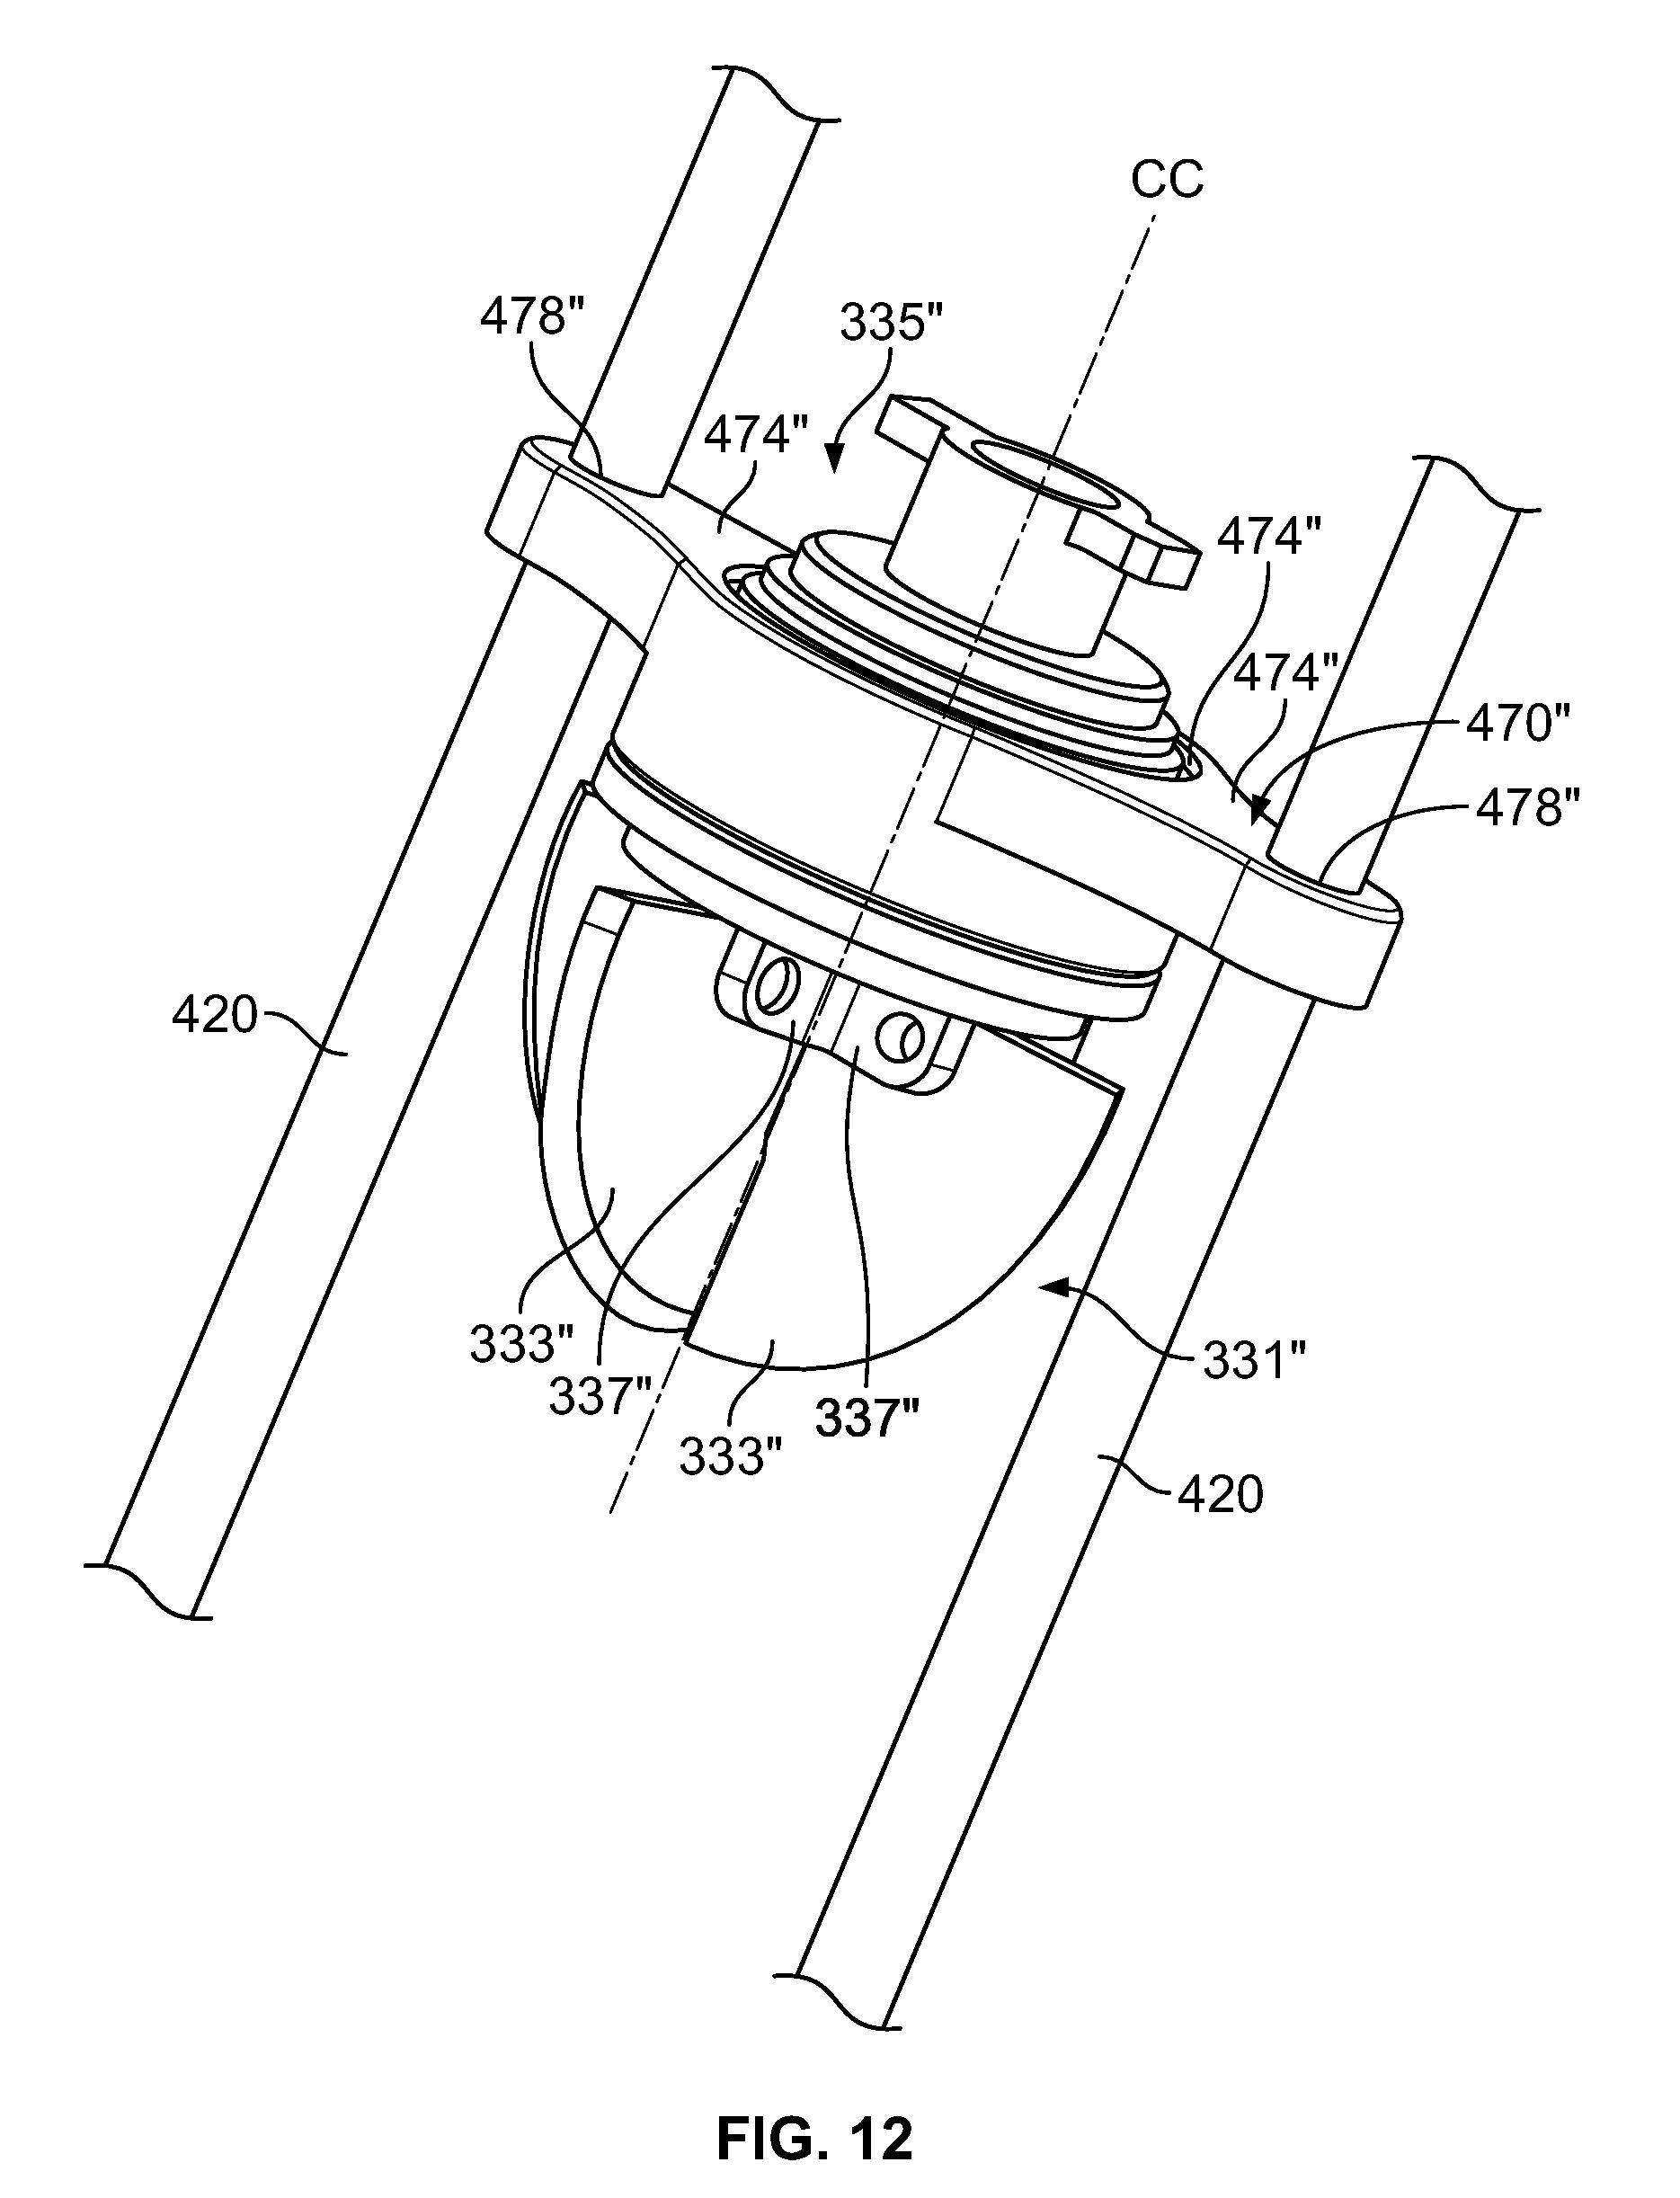 F Spark Plug Wiring Diagram on 2002 f150 spark plug diagram, 2003 f150 spark plug diagram, 1999 f150 spark plug diagram, 1997 f150 spark plug diagram, 2000 explorer spark plug diagram,